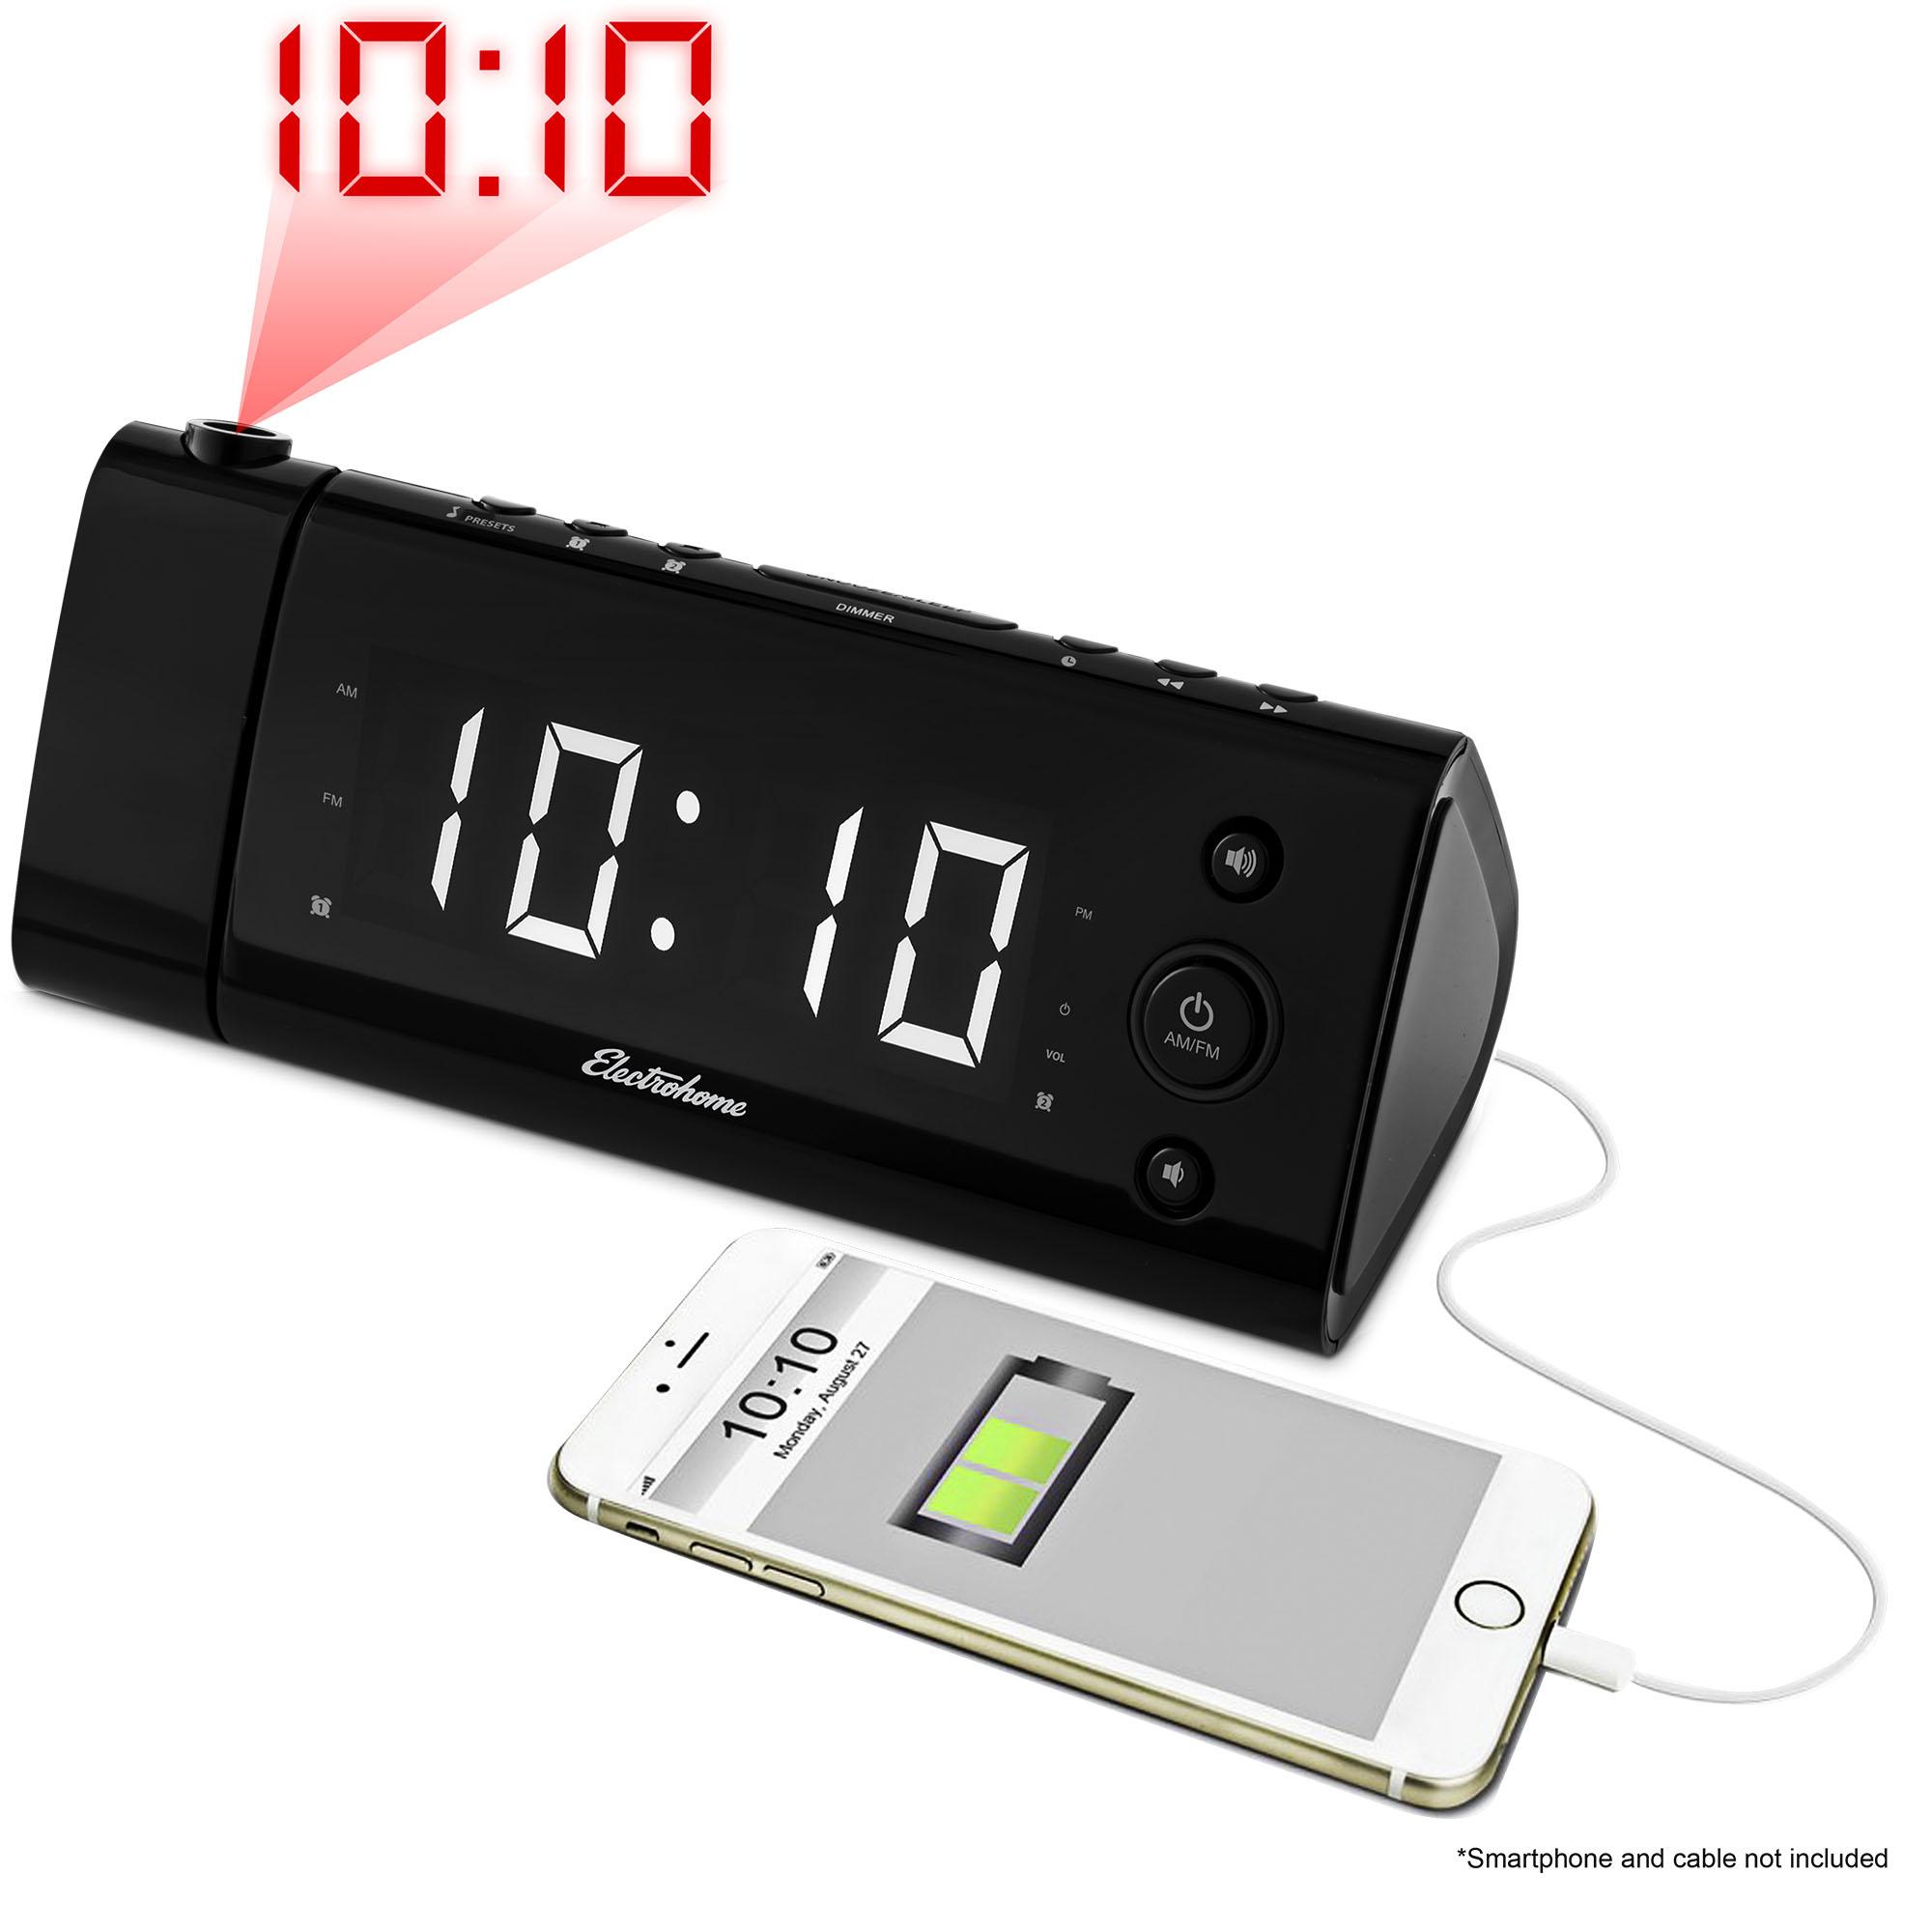 1 eaac475w main with smartphone v2